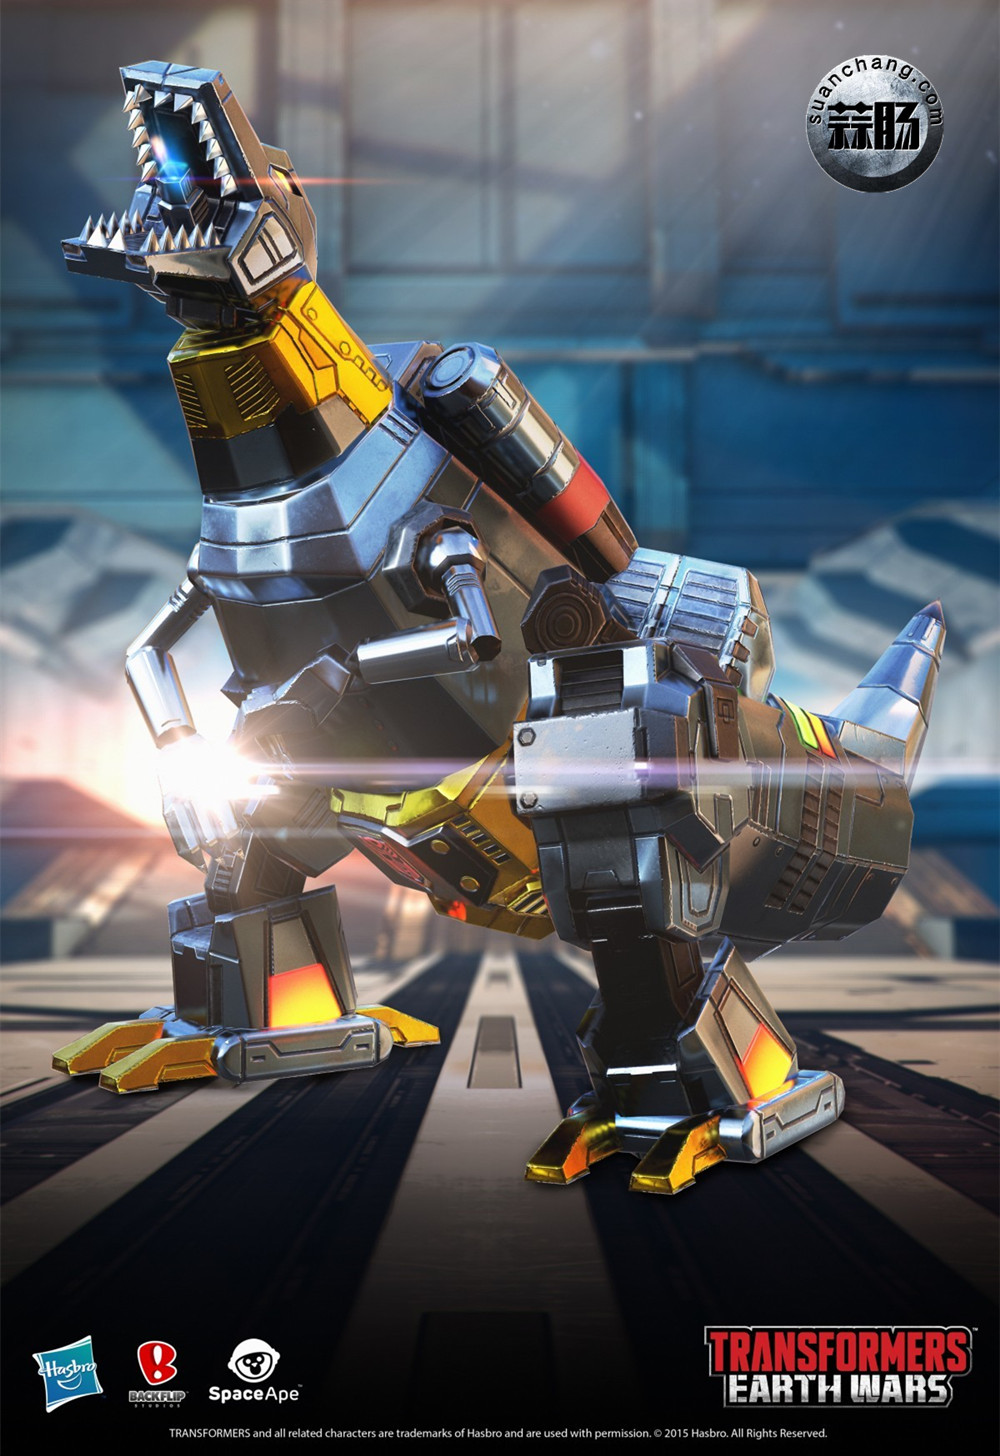 Transformers Earth Wars 游戏人物(一) 动态 第5张